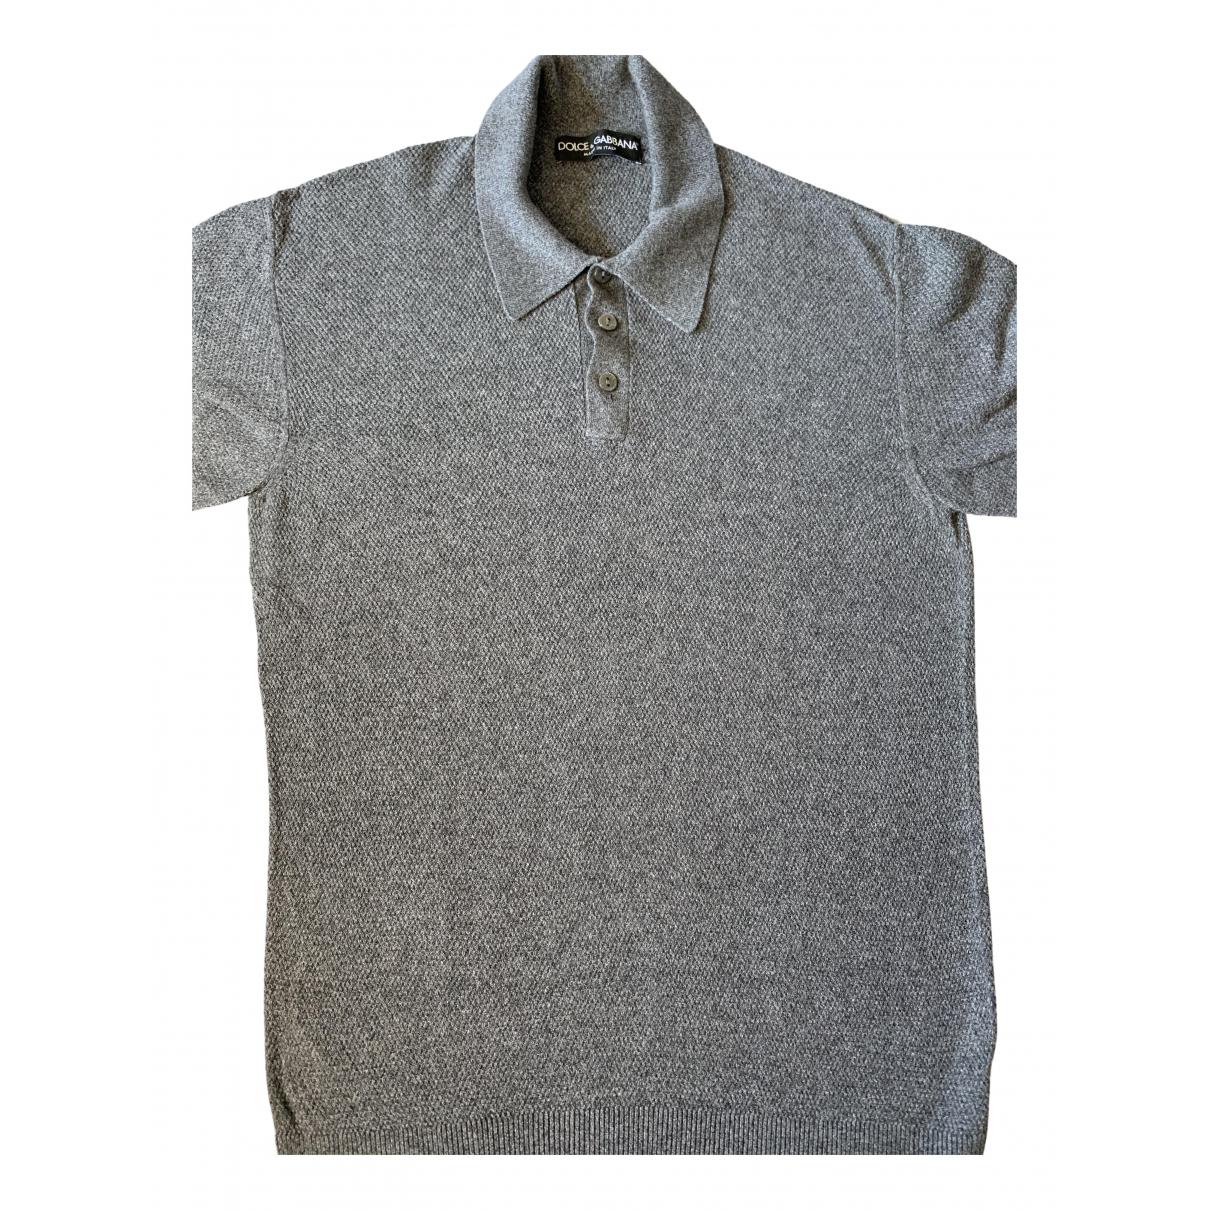 Dolce & Gabbana - Polos   pour homme en coton - gris